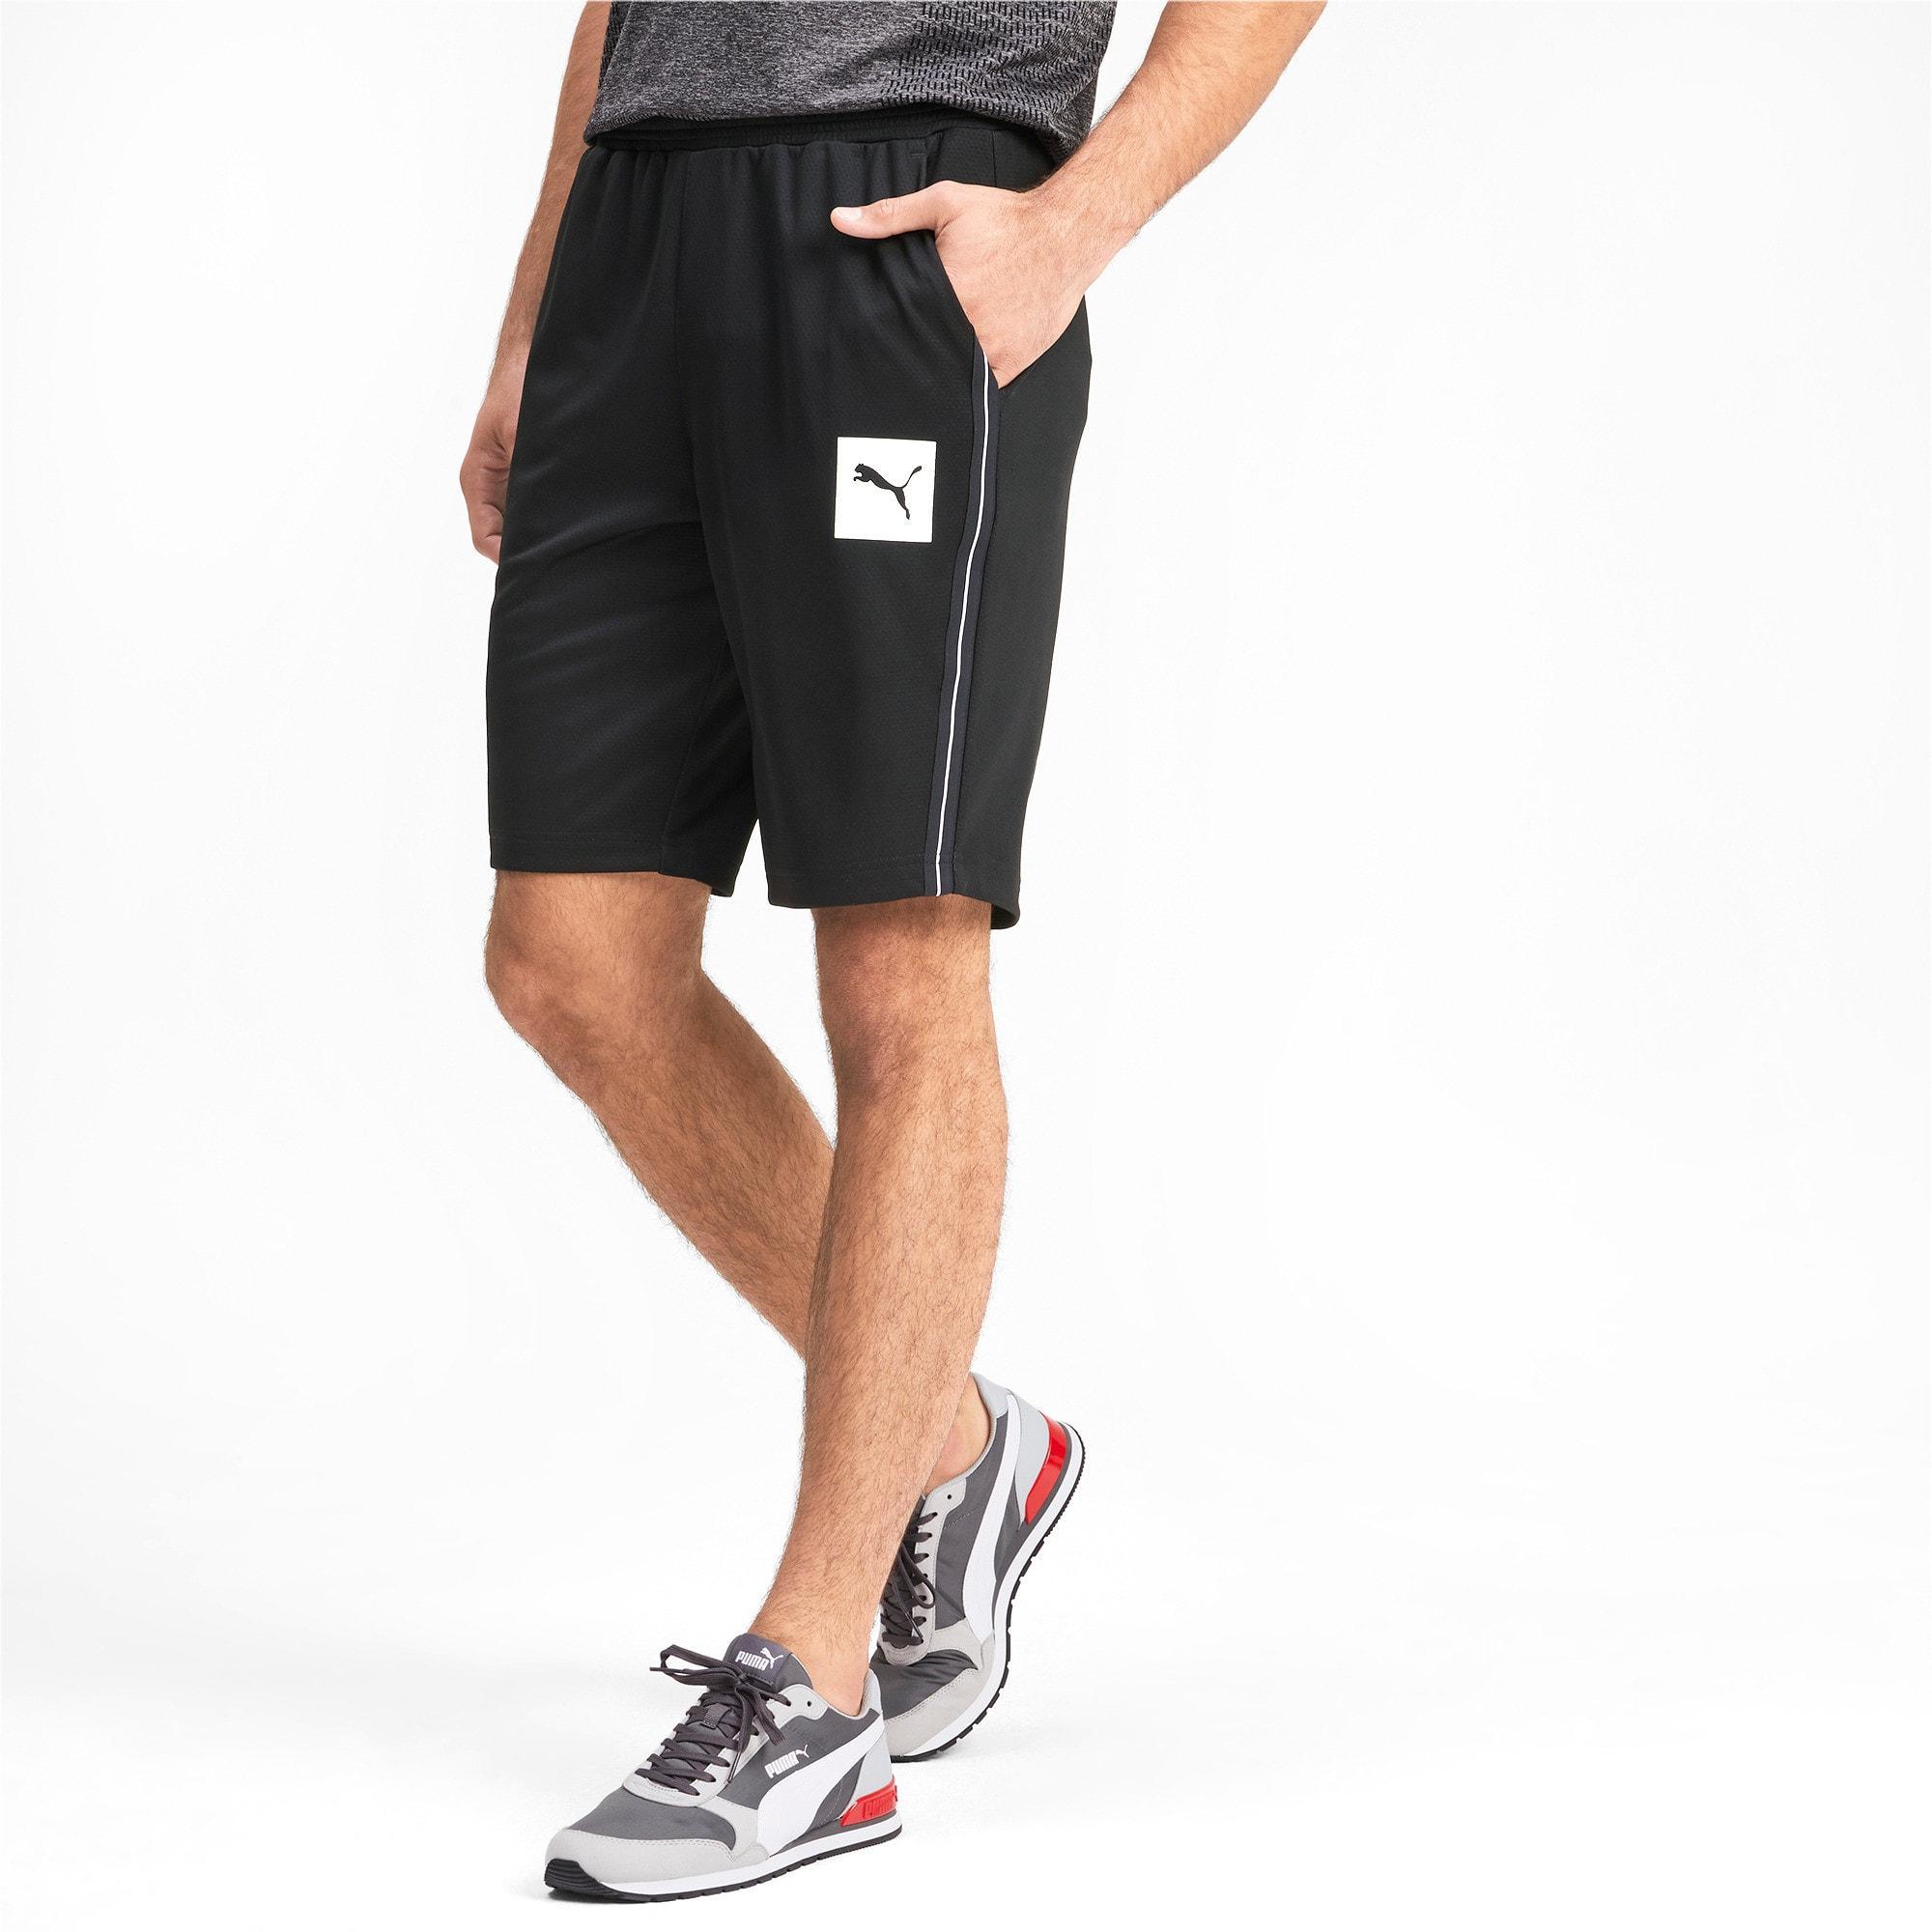 Thumbnail 1 of Tec Sports Interlock Men's Shorts, Puma Black, medium-IND